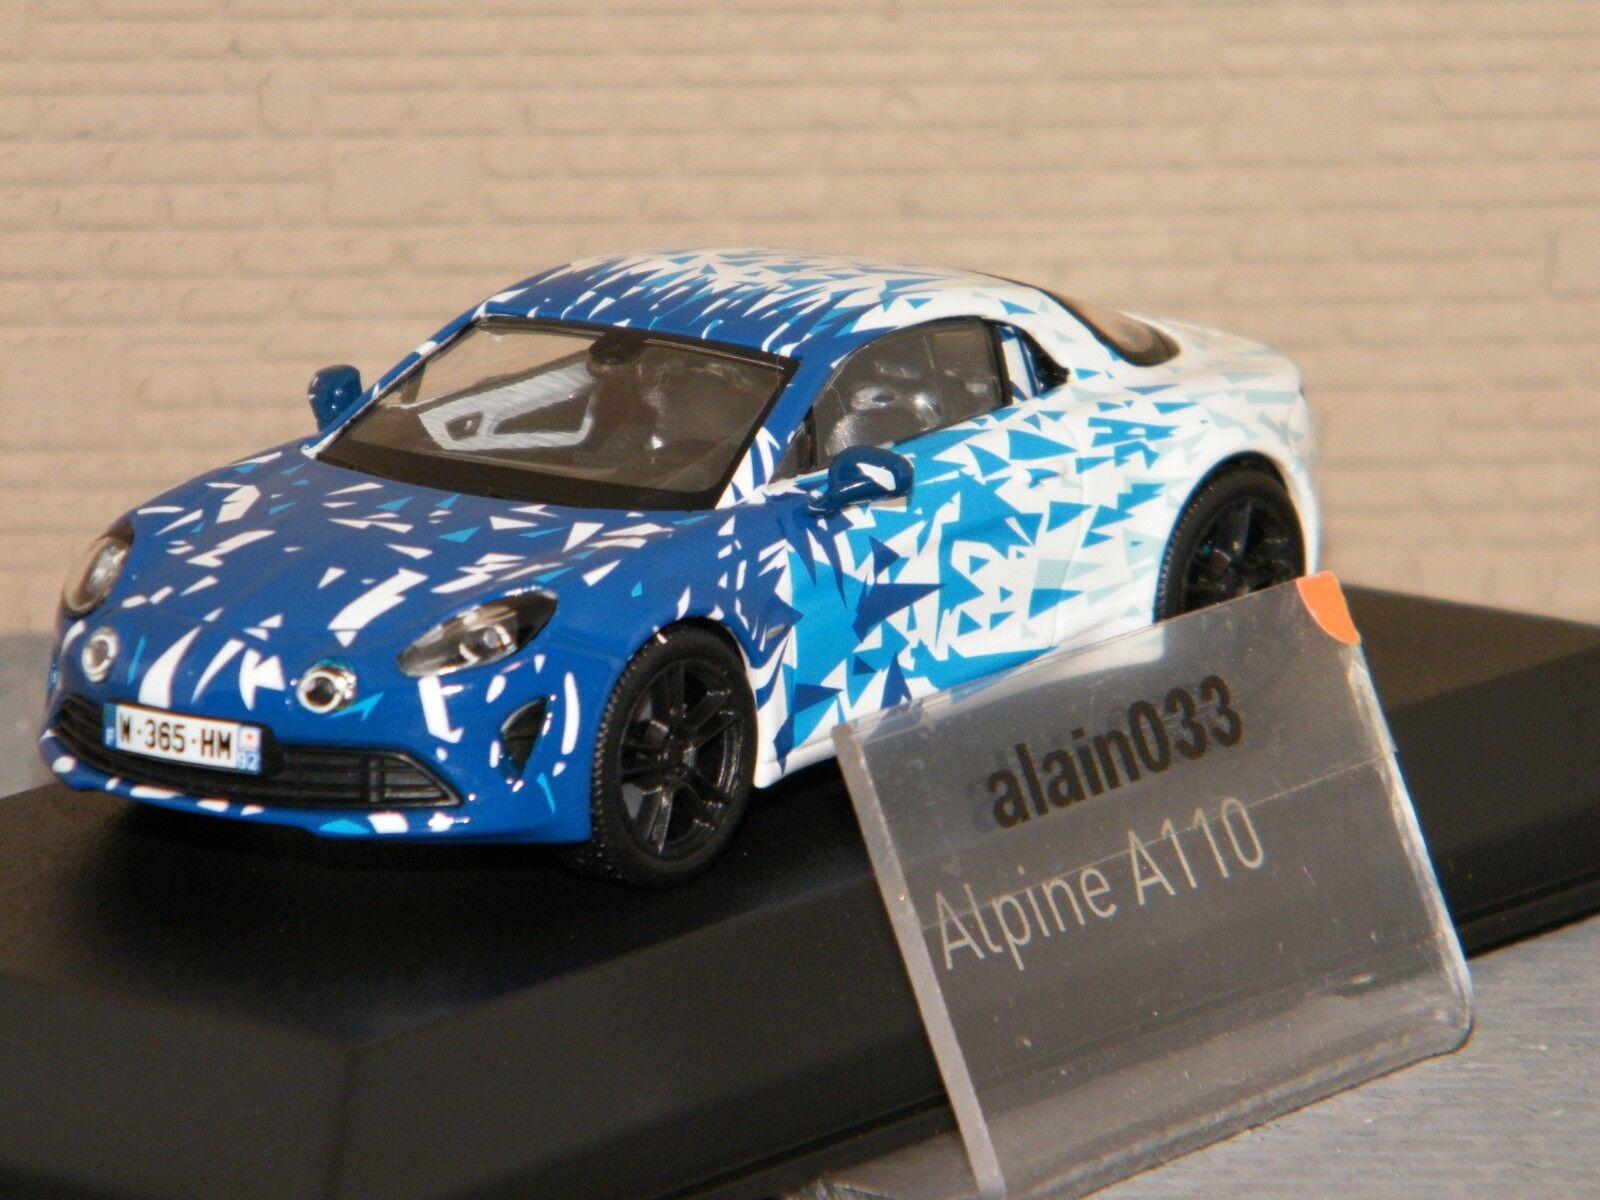 ALPINE A110 2017 blanc & bleu Test Version NOREV 1 43 Ref 517863